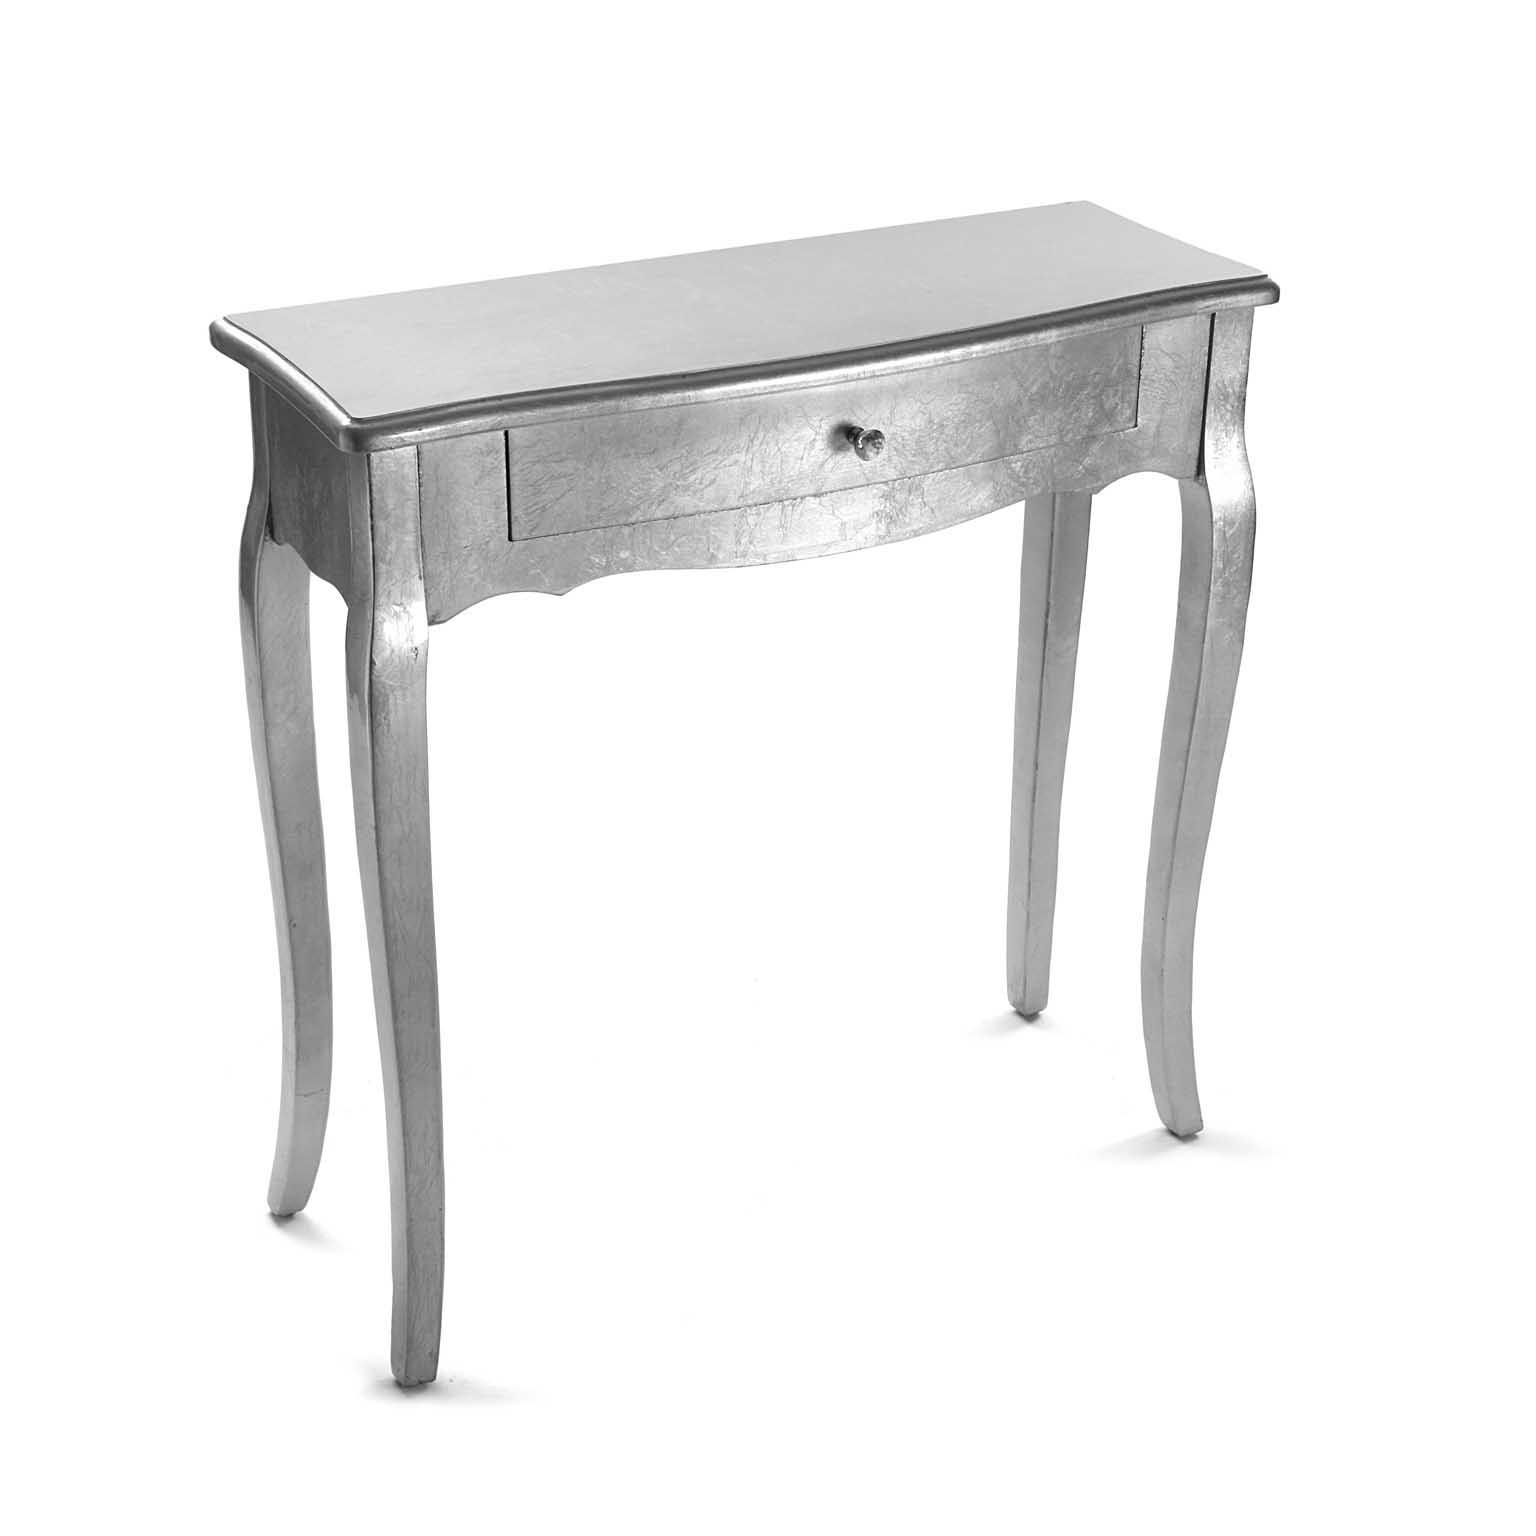 32482-consola-argento-plata.jpg